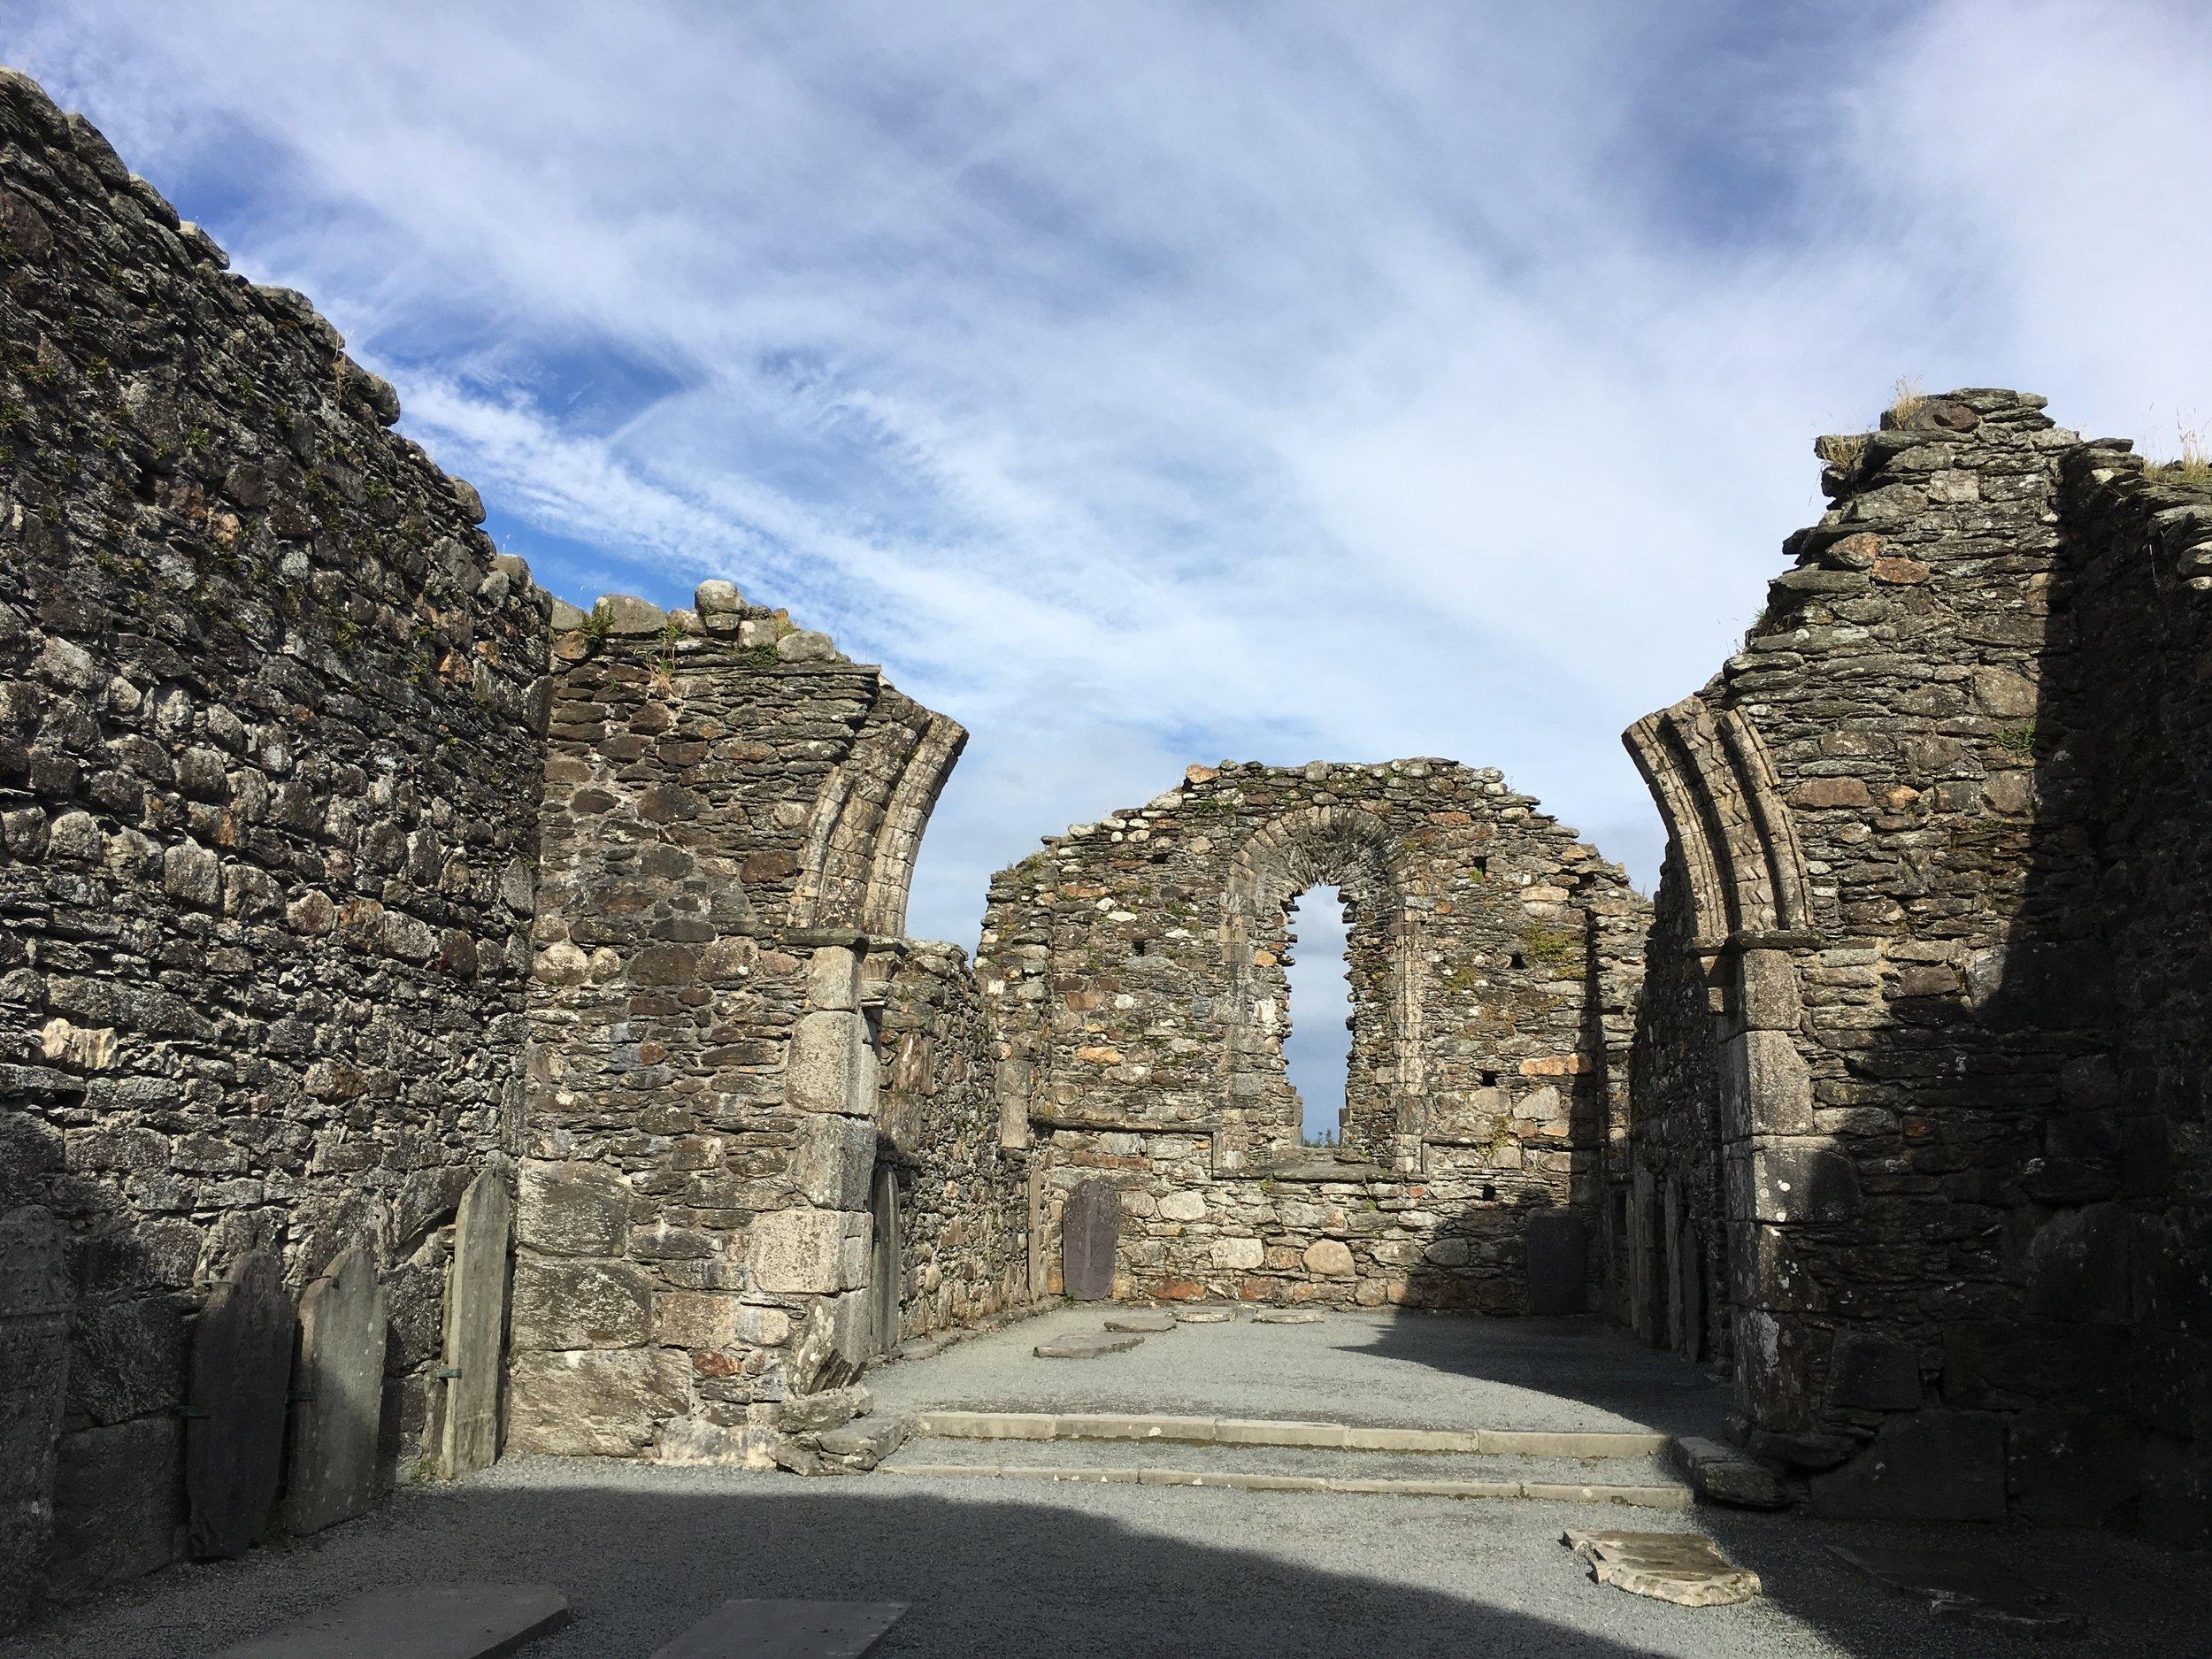 The ruins at Glendalough